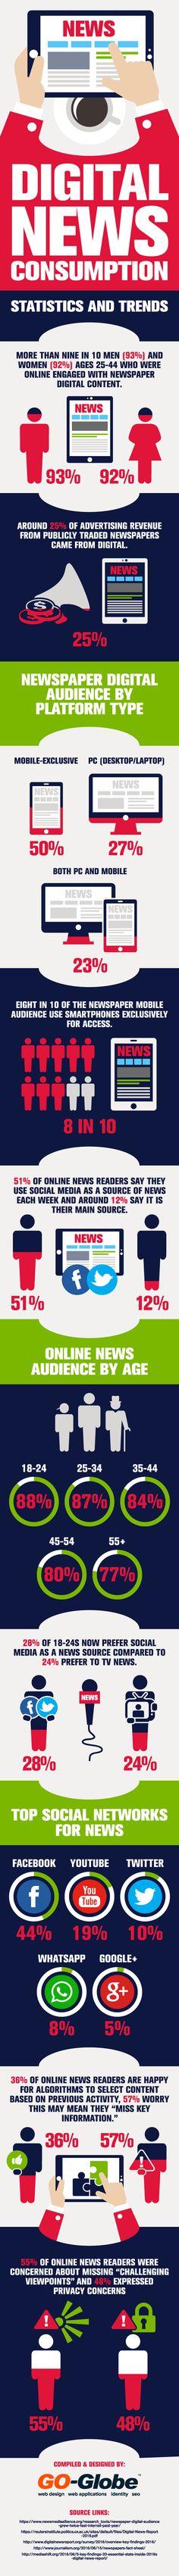 Rise of Digital News Consumption